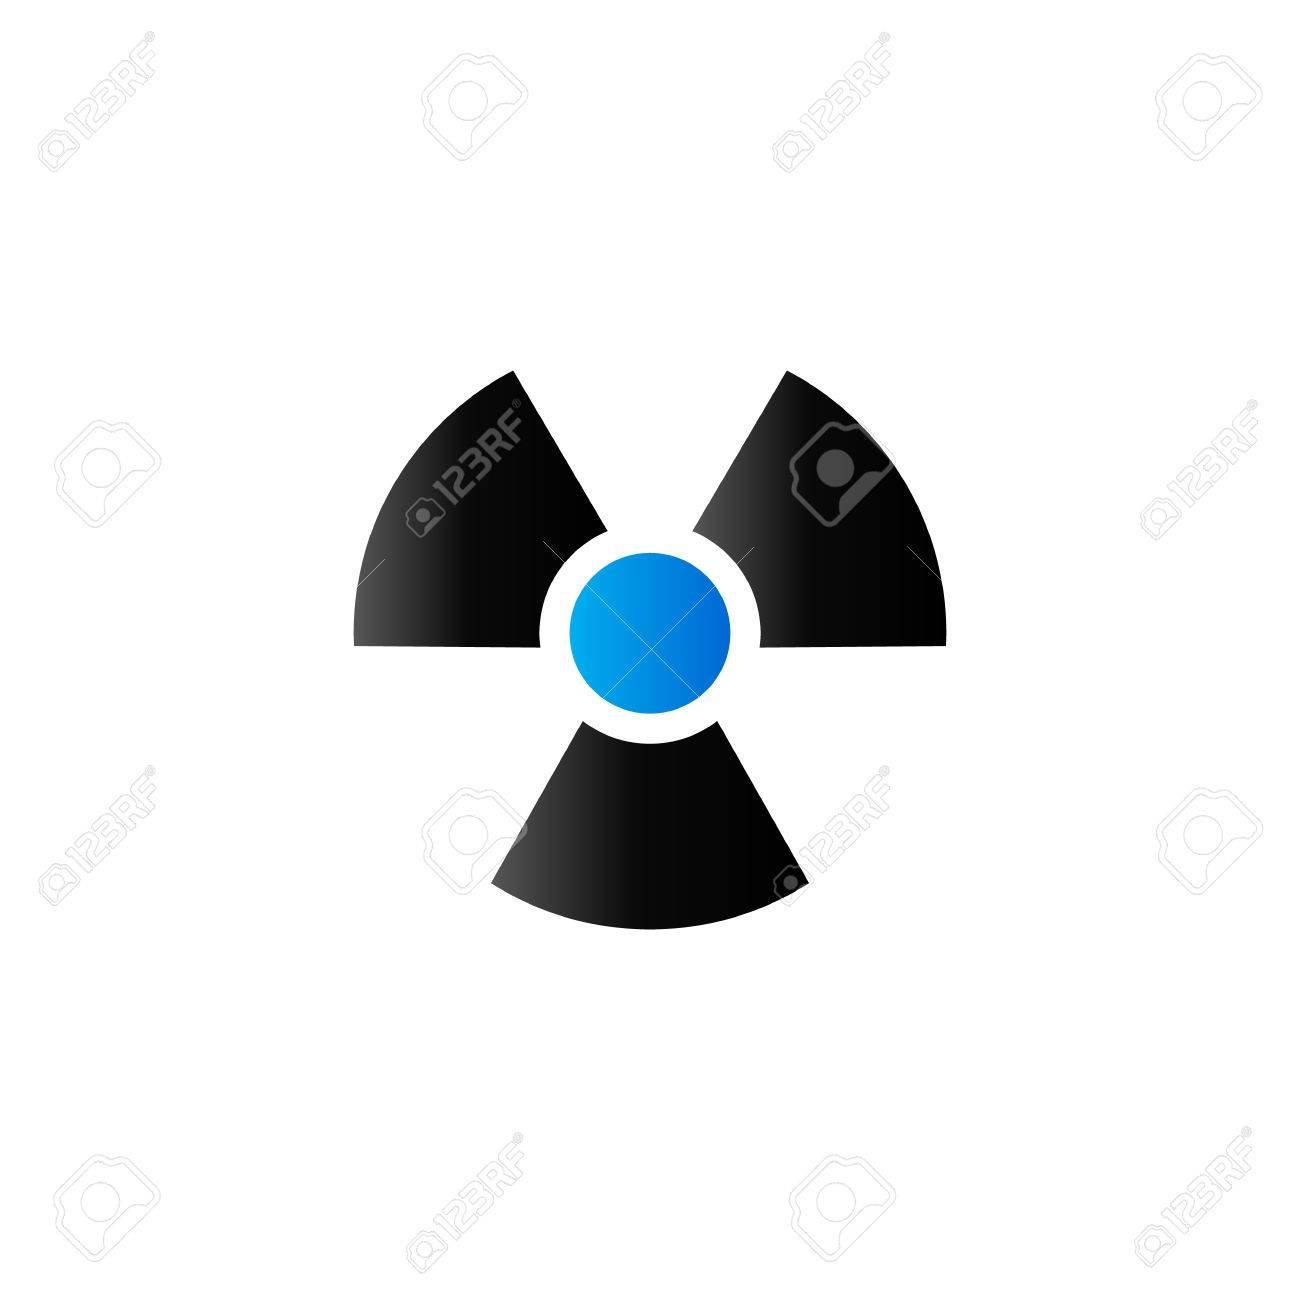 Radioactive symbol icon in duo tone color science research radioactive symbol icon in duo tone color science research nuclear energy stock vector 71631975 buycottarizona